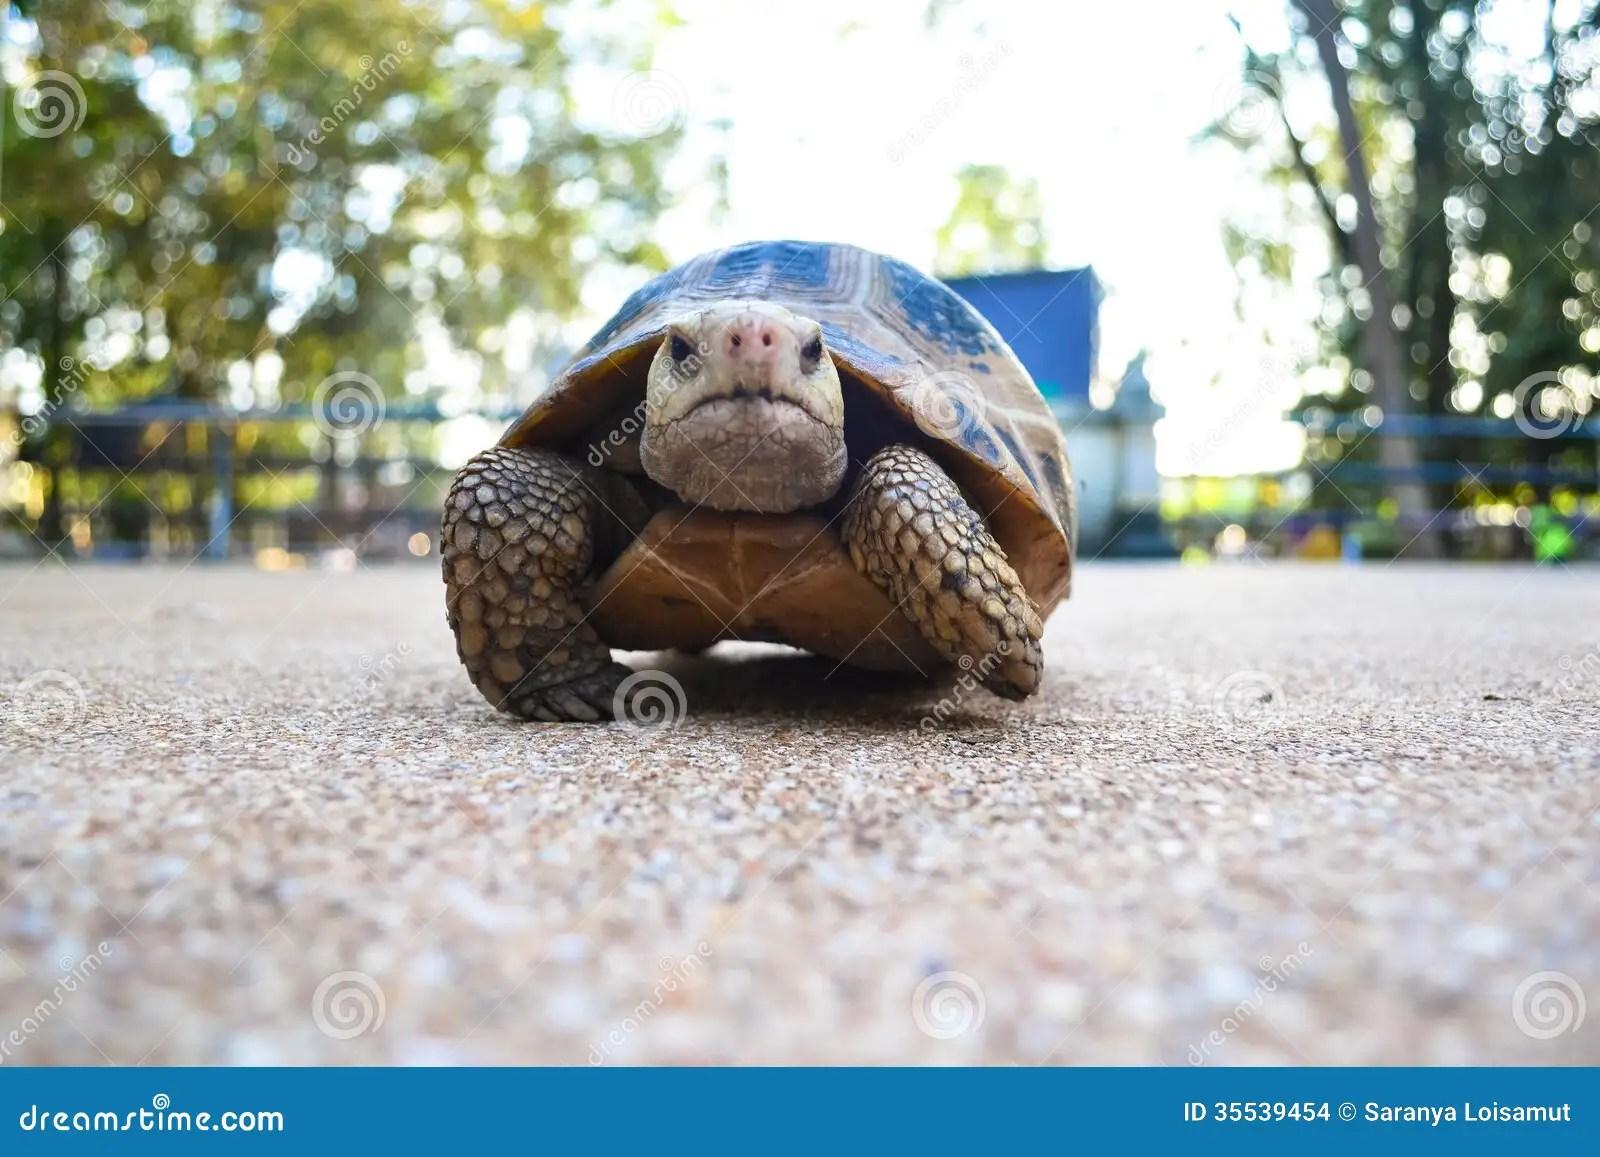 Turtle On The Floor Stock Photo Image Of Leisurely